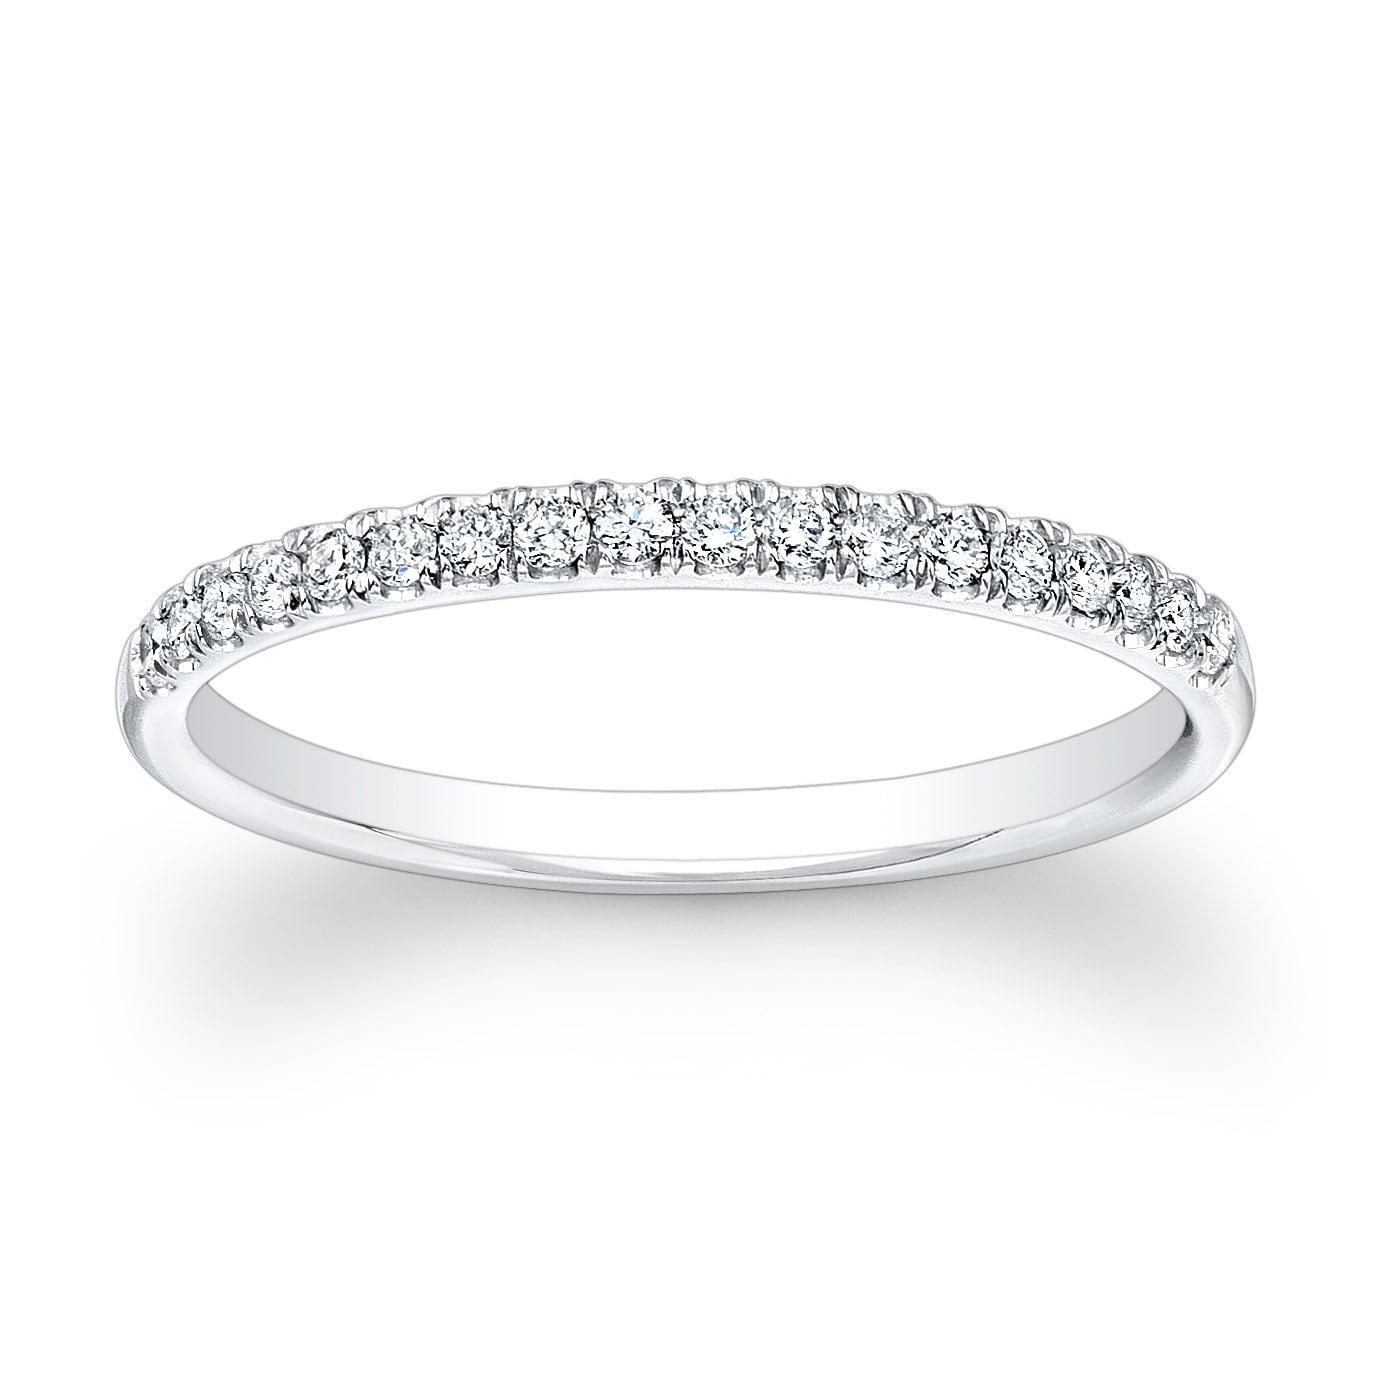 Diamond Wedding Bands.Ladies Platinum And Diamond Wedding Band 0 20 Ctw G Vs2 Quality Diamonds